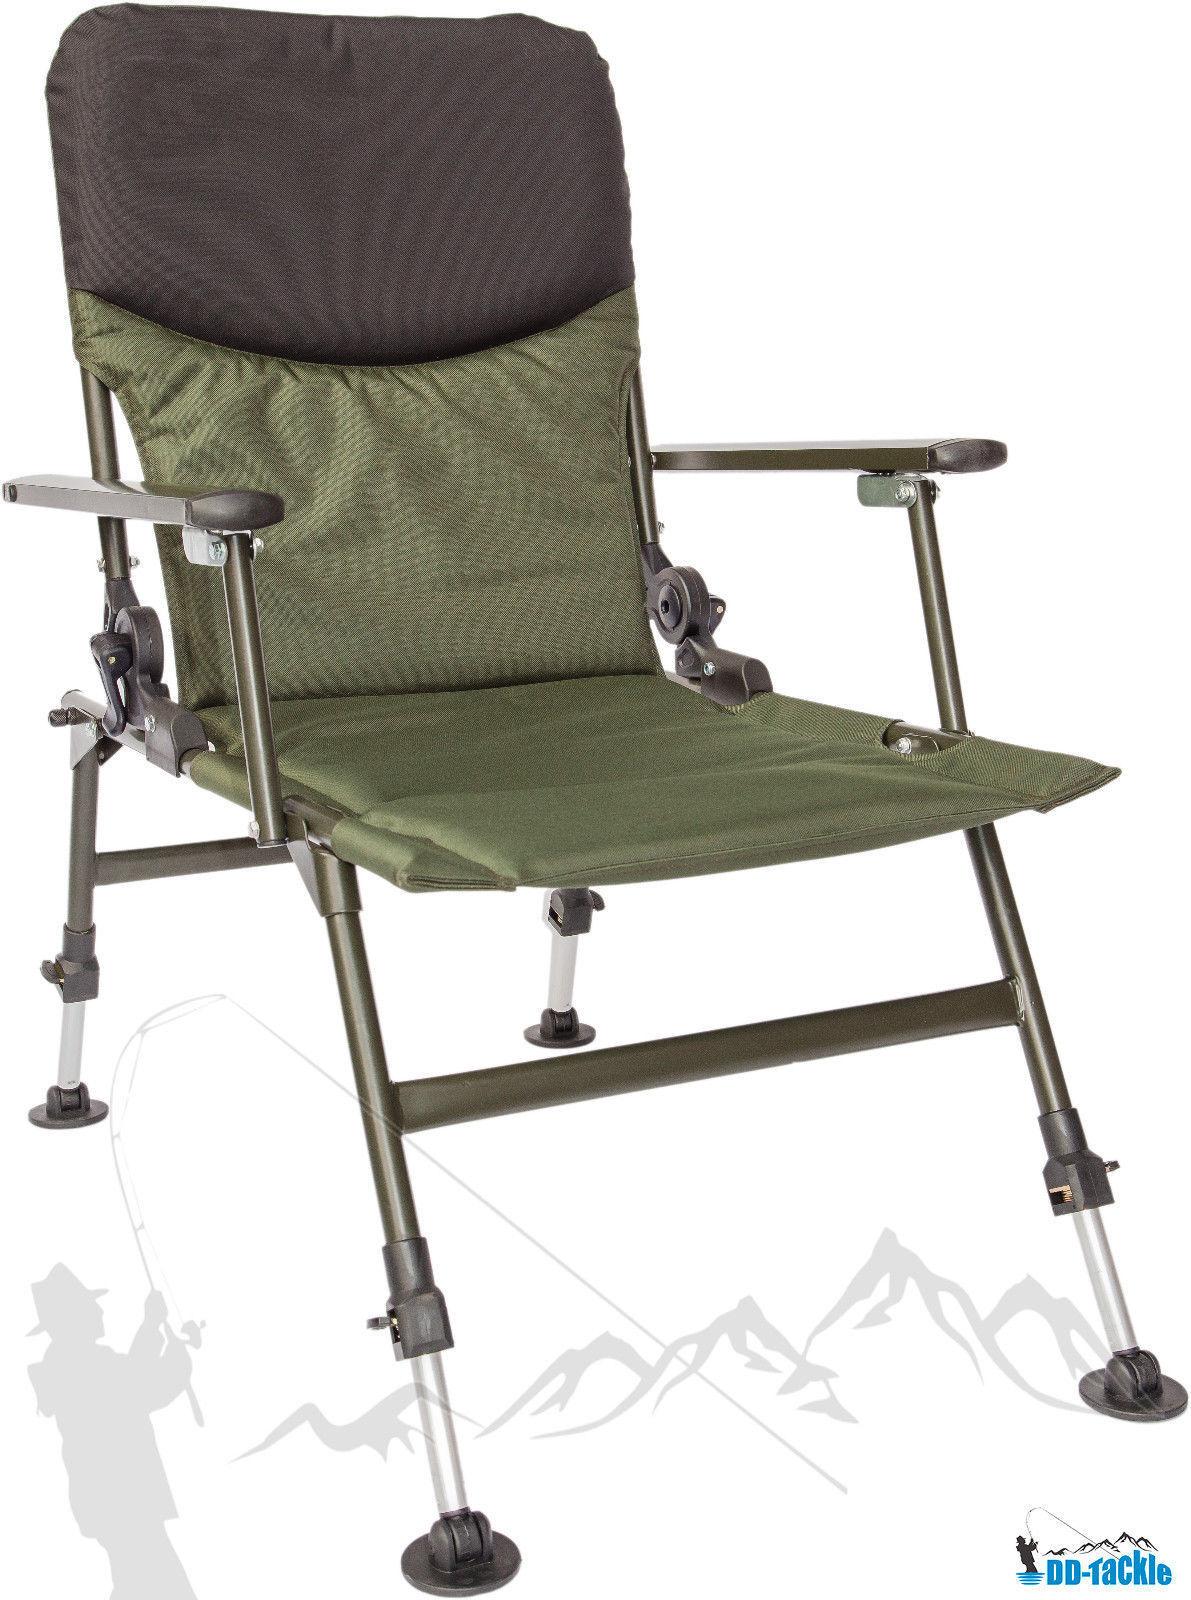 Deluxe karpfenstuhl con reposabrazos angel angel angel silla angel silla silla de carpas carp Chair 20a894